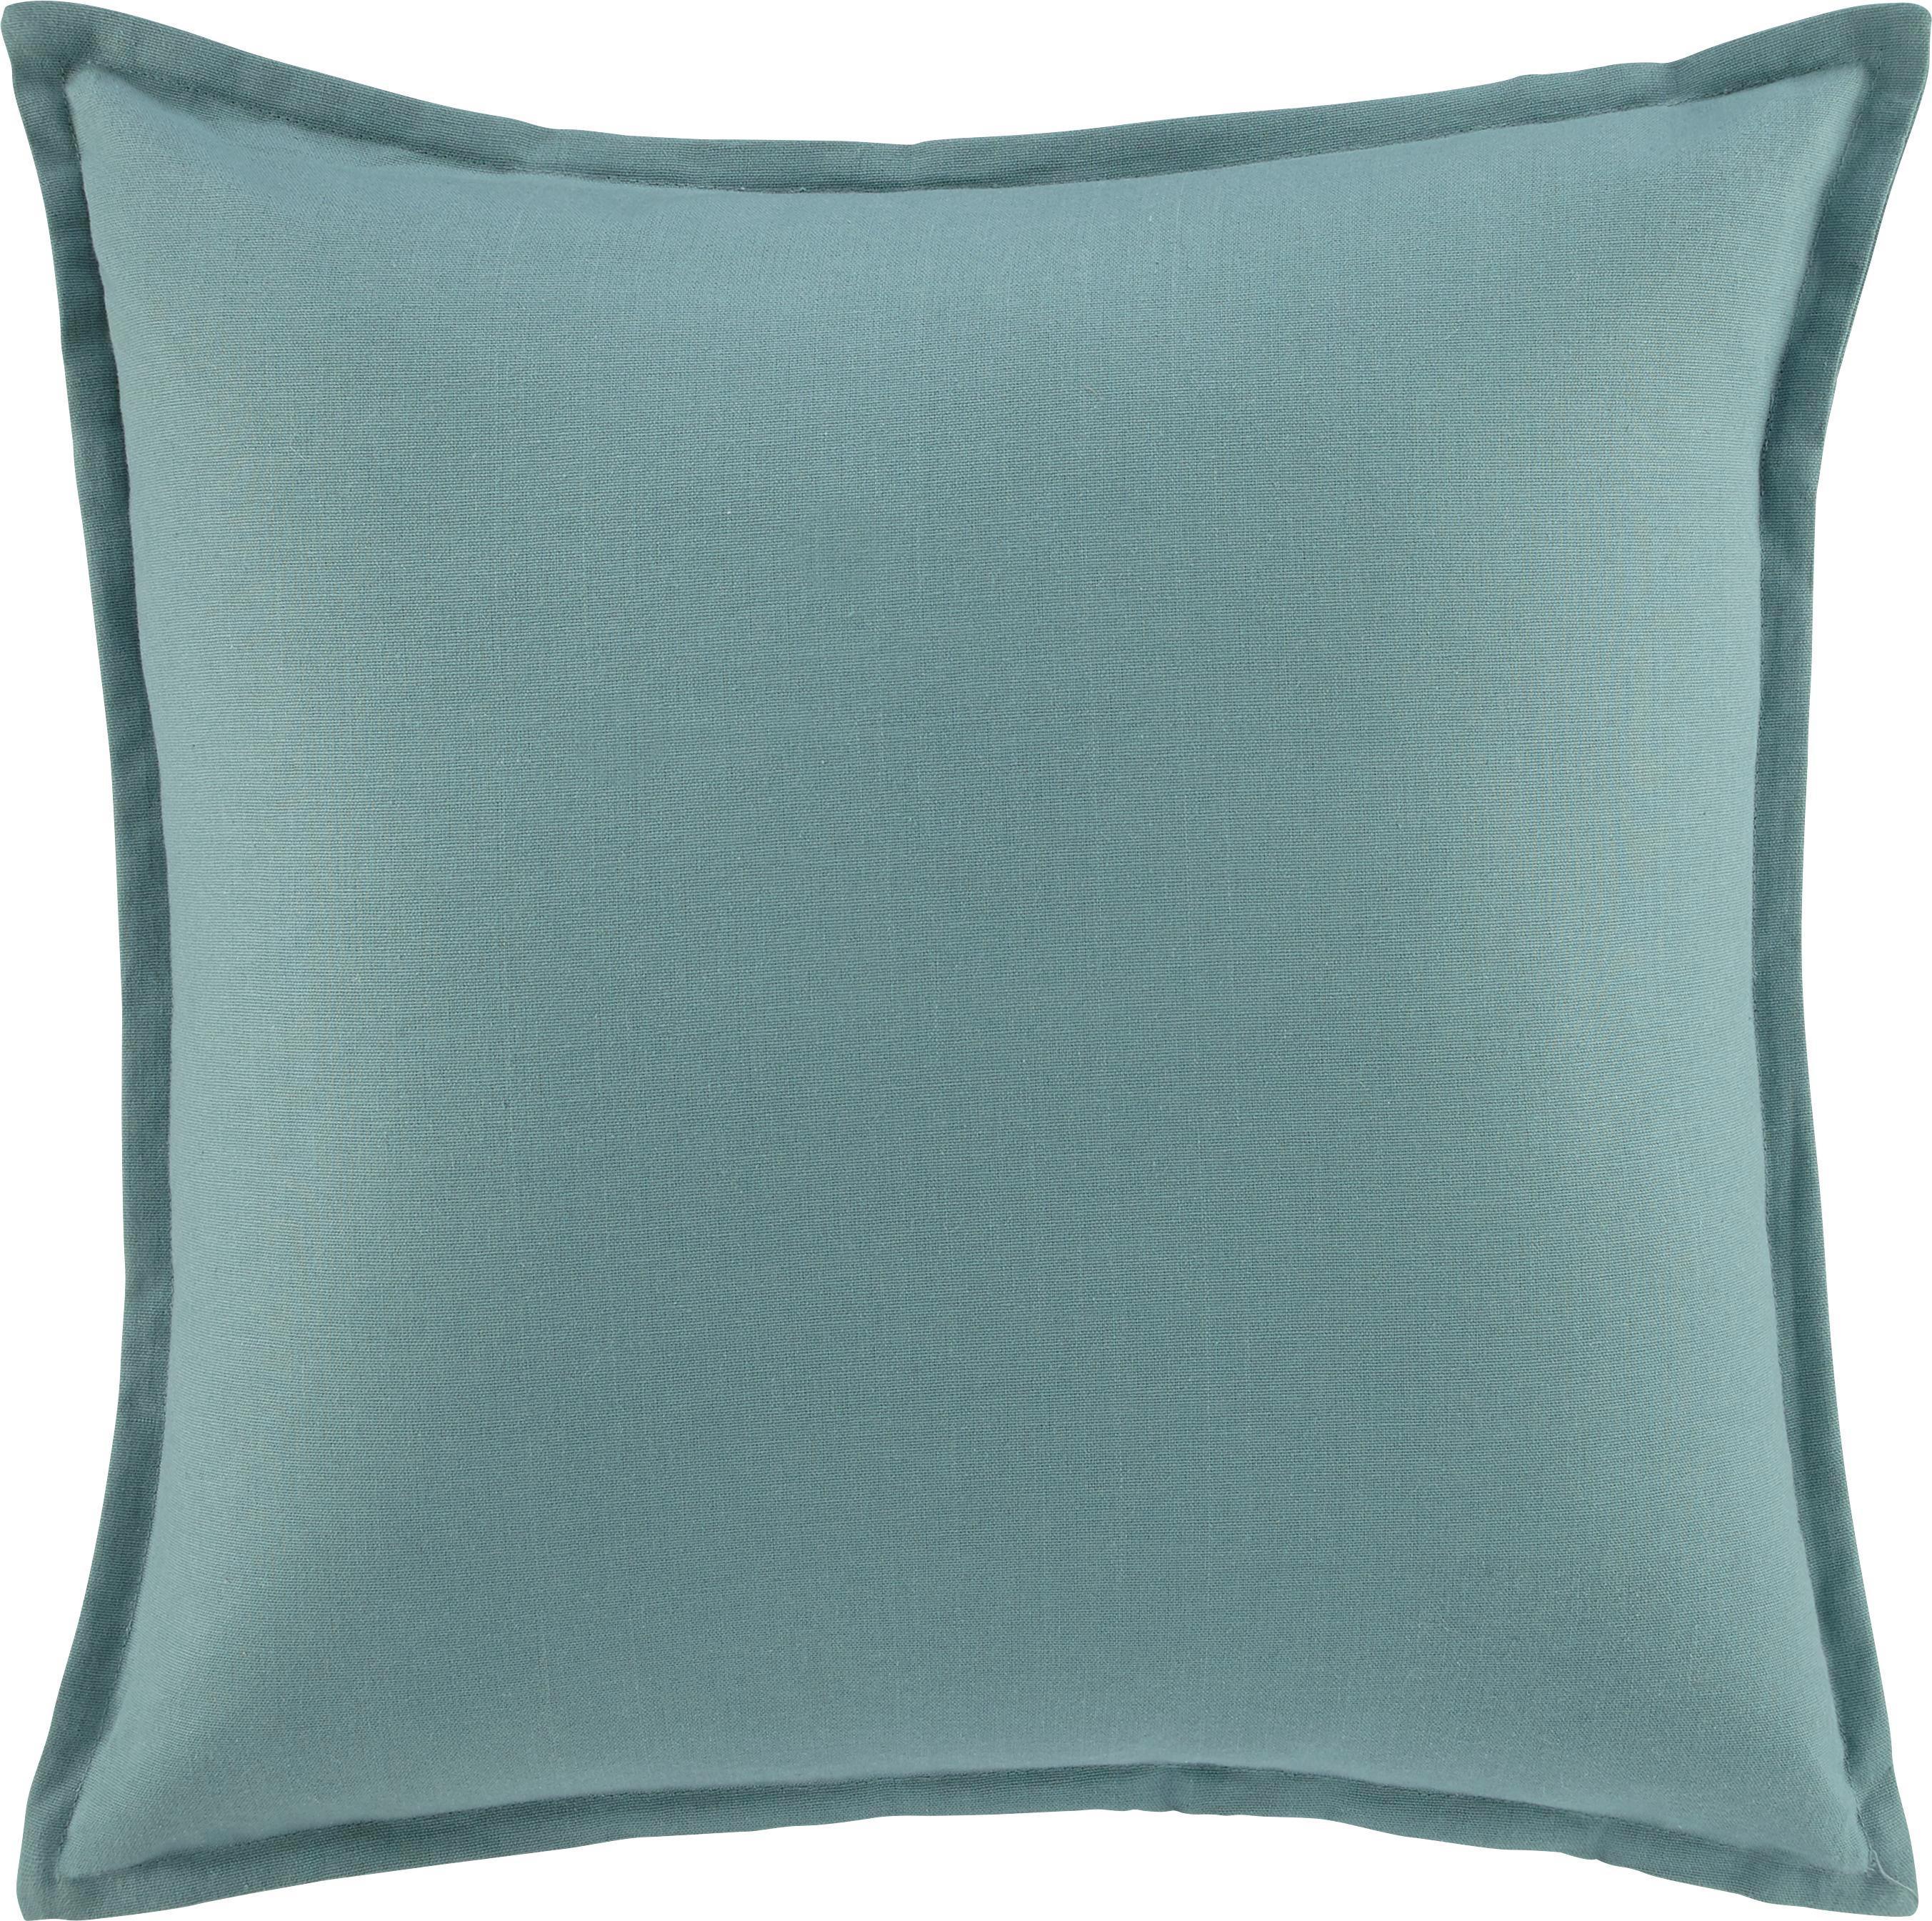 Díszpárna Sonja - zöld, textil (45/45cm) - MÖMAX modern living